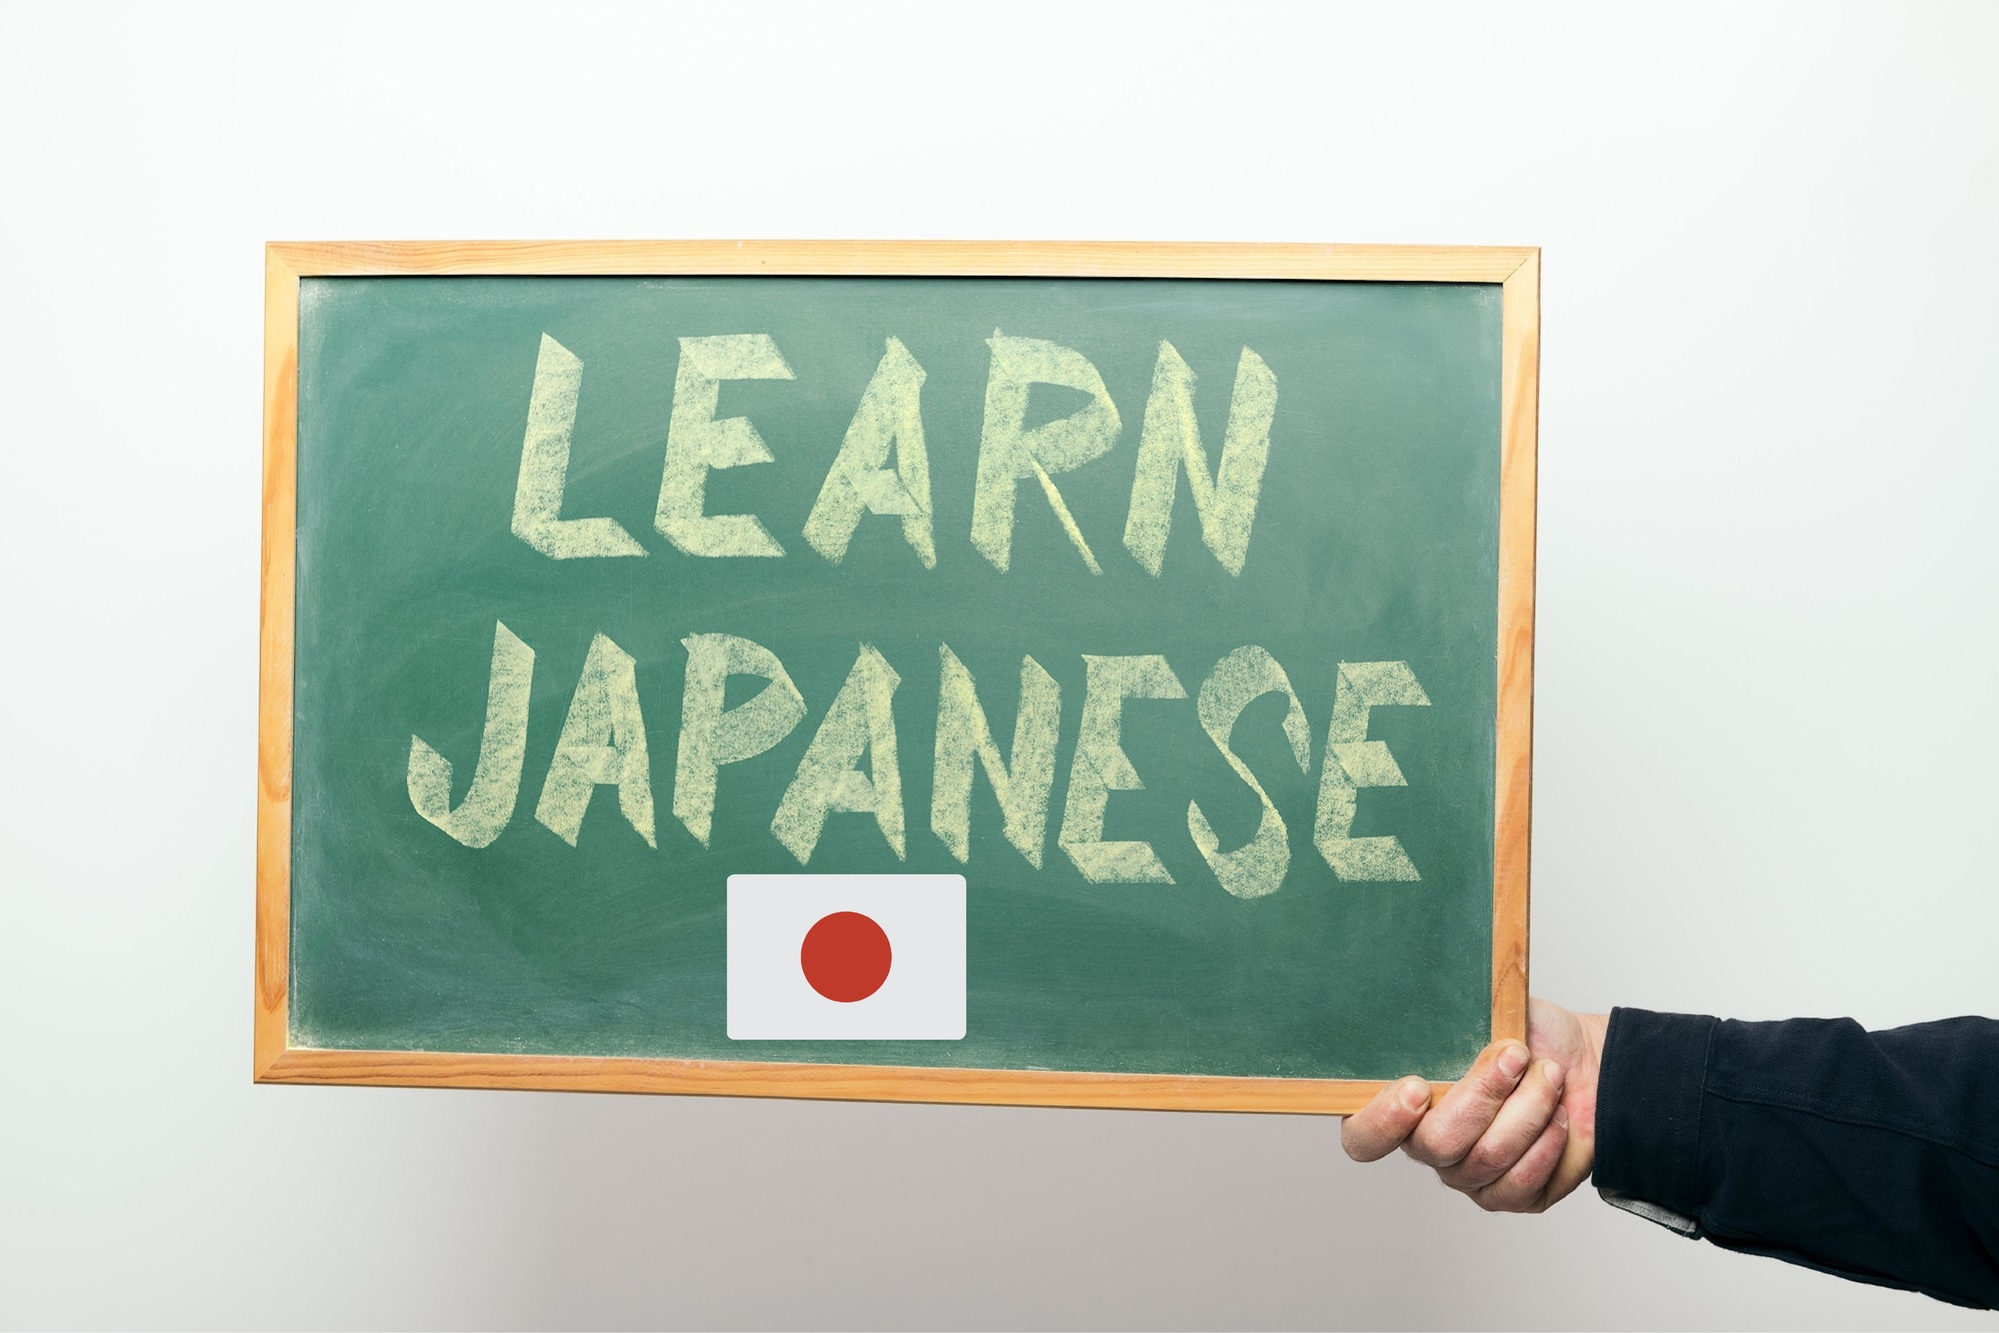 Japanese language classes in Mumbai